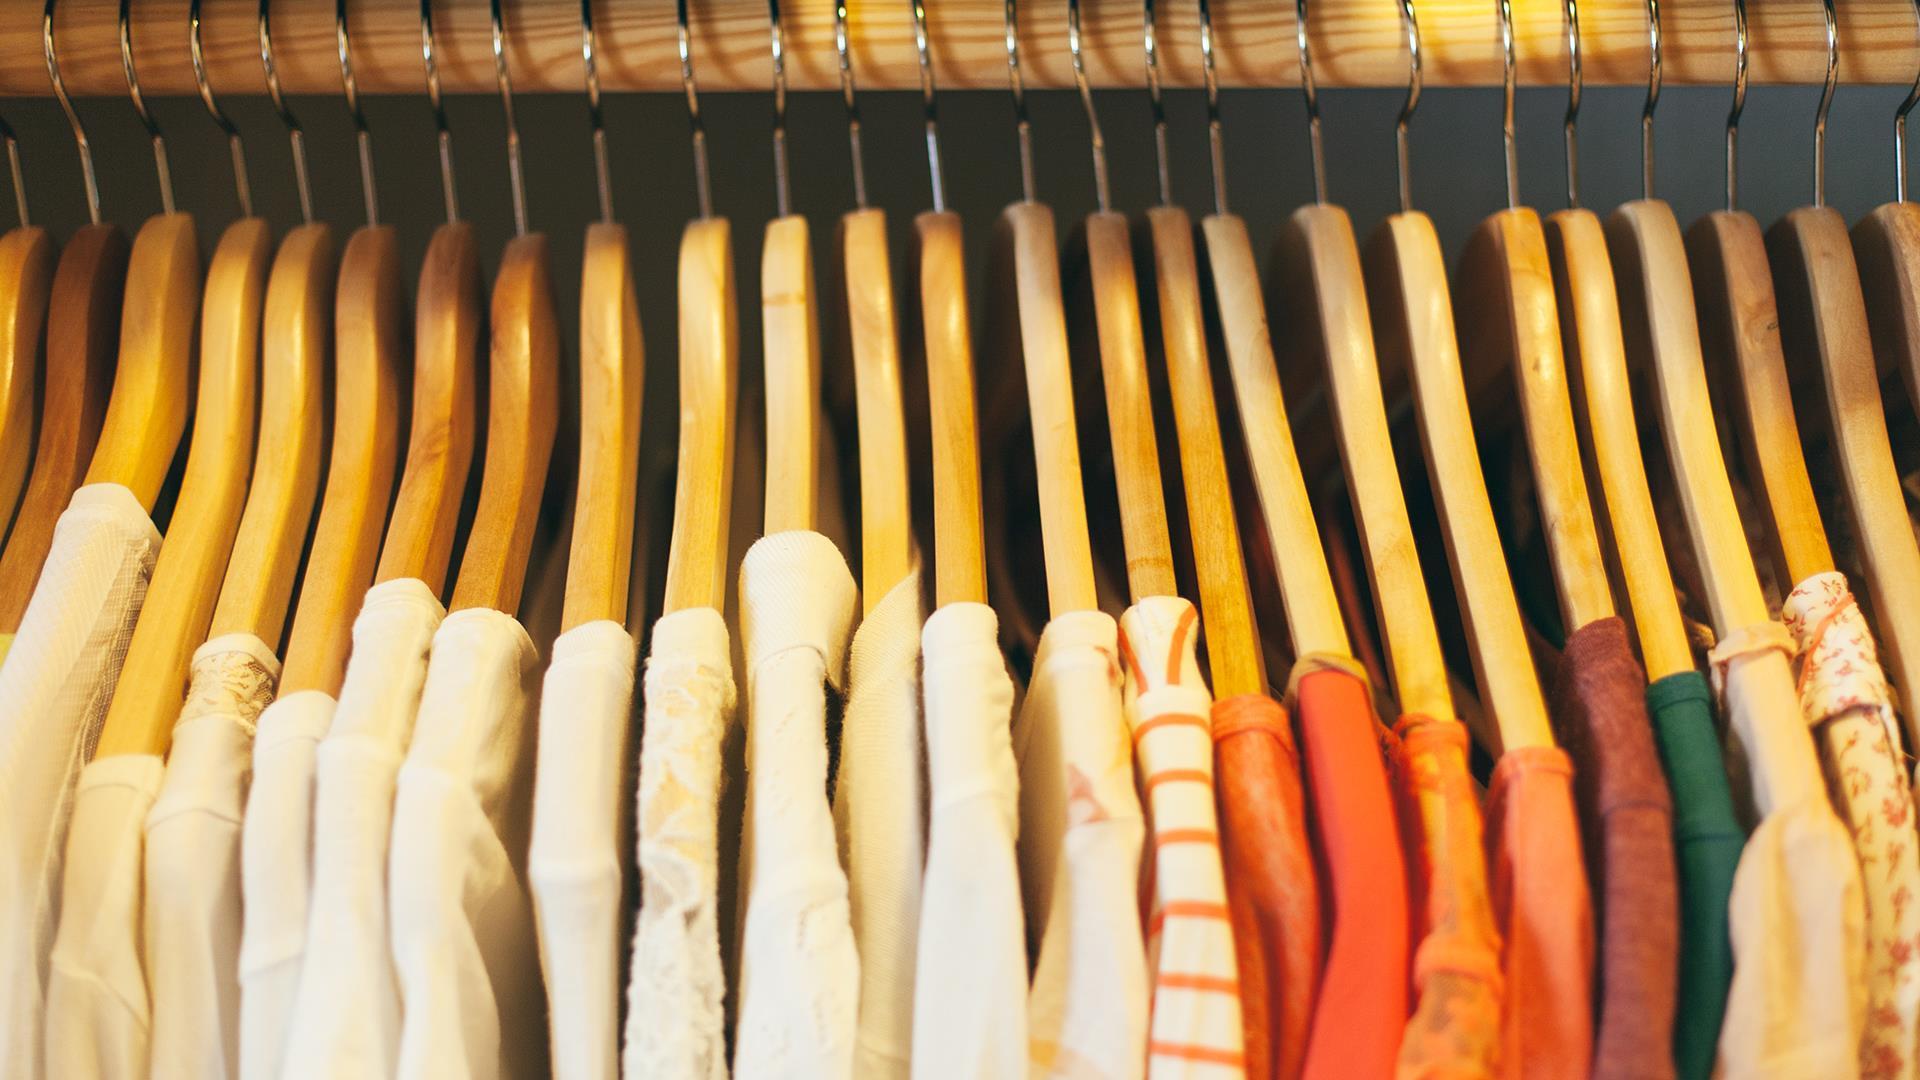 Closet organization ideas: 56 affordable closet organizers